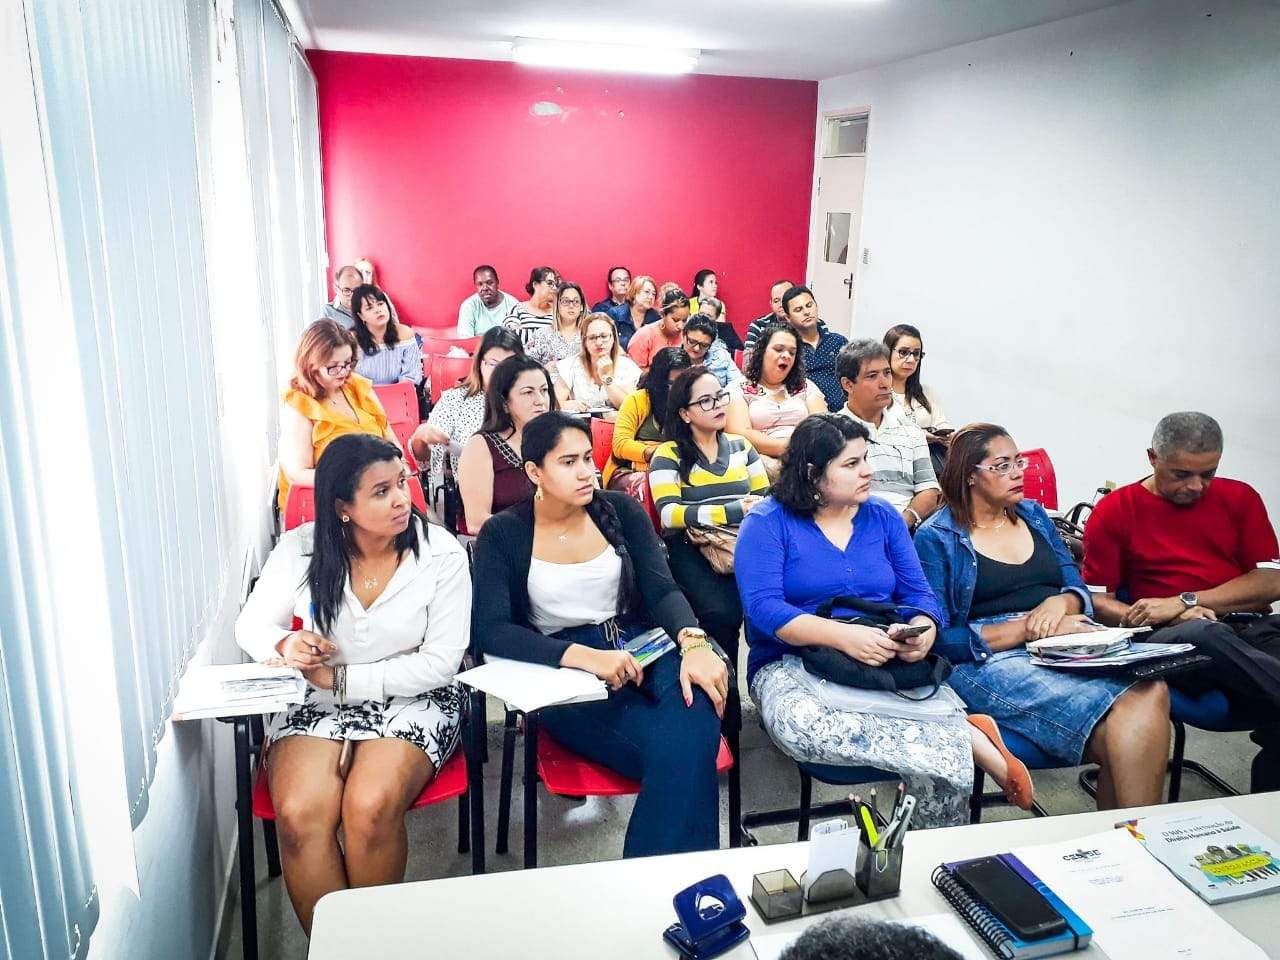 Conselho Estadual de Sergipe se organiza para a 1ª Conferência da Saúde Indígena